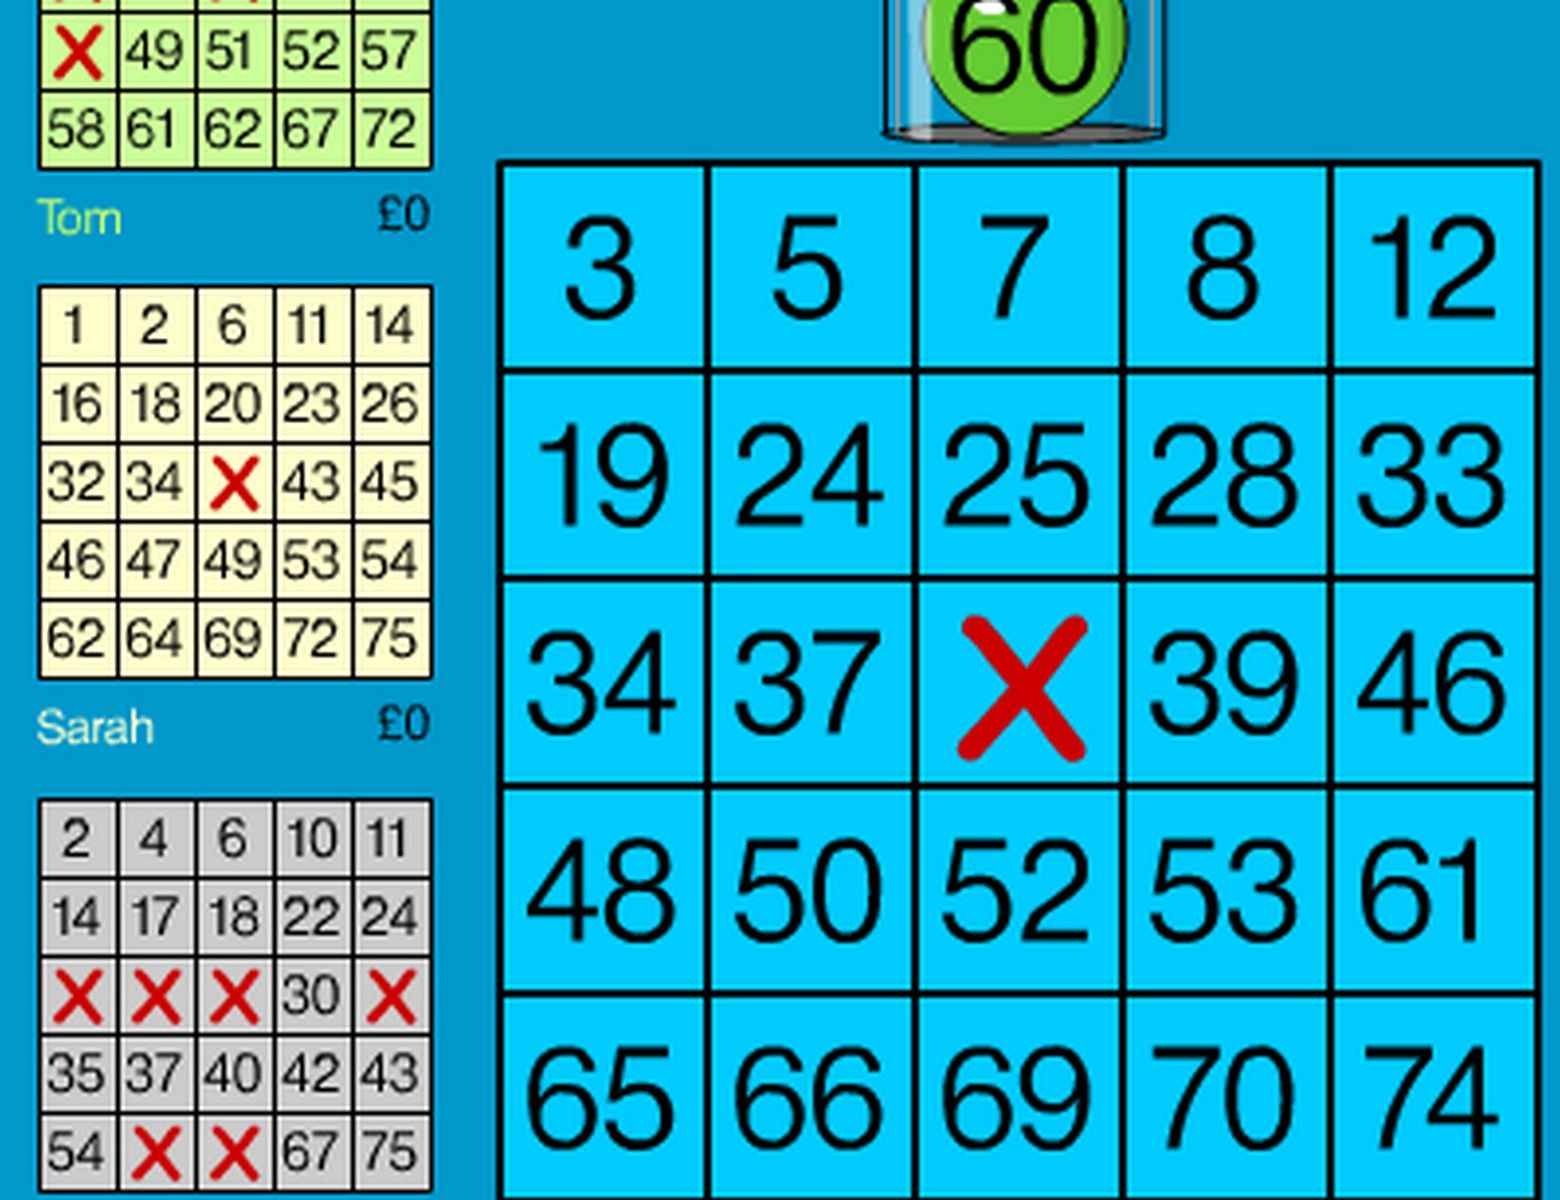 247 Games Bingo Games Games Free Online Games